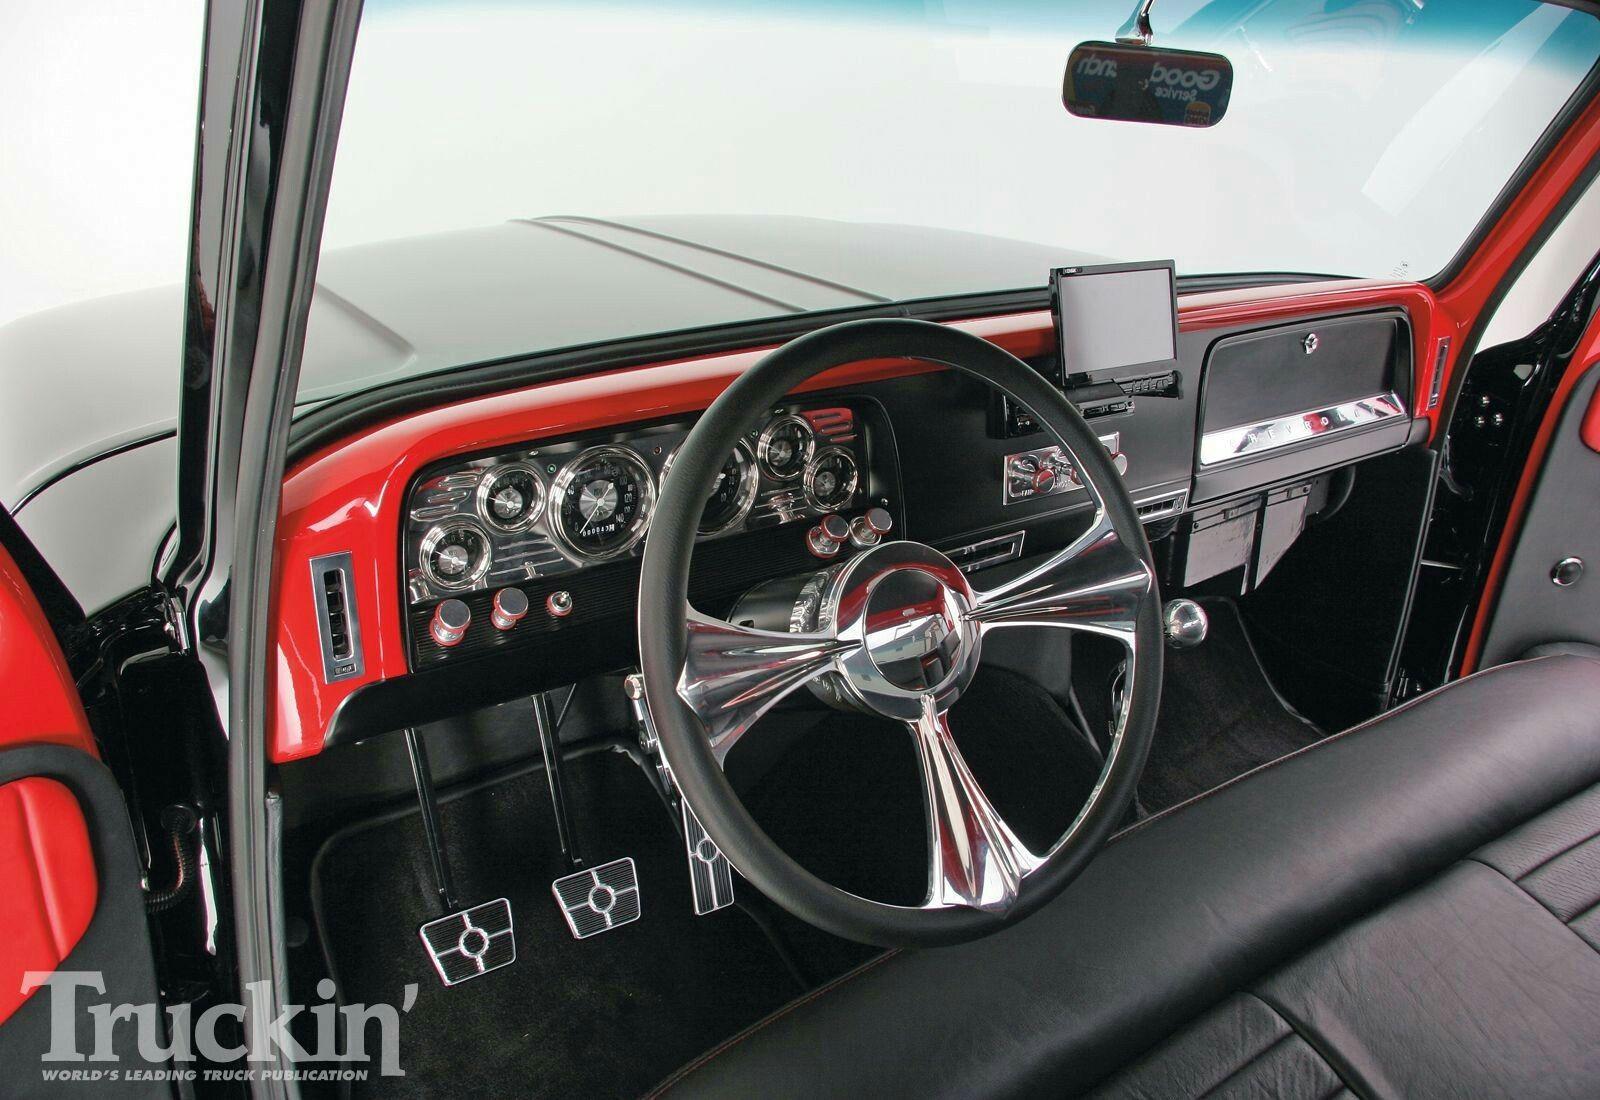 Pickup chevrolet chevy trucks classic trucks interior magazines black ideas html driveways